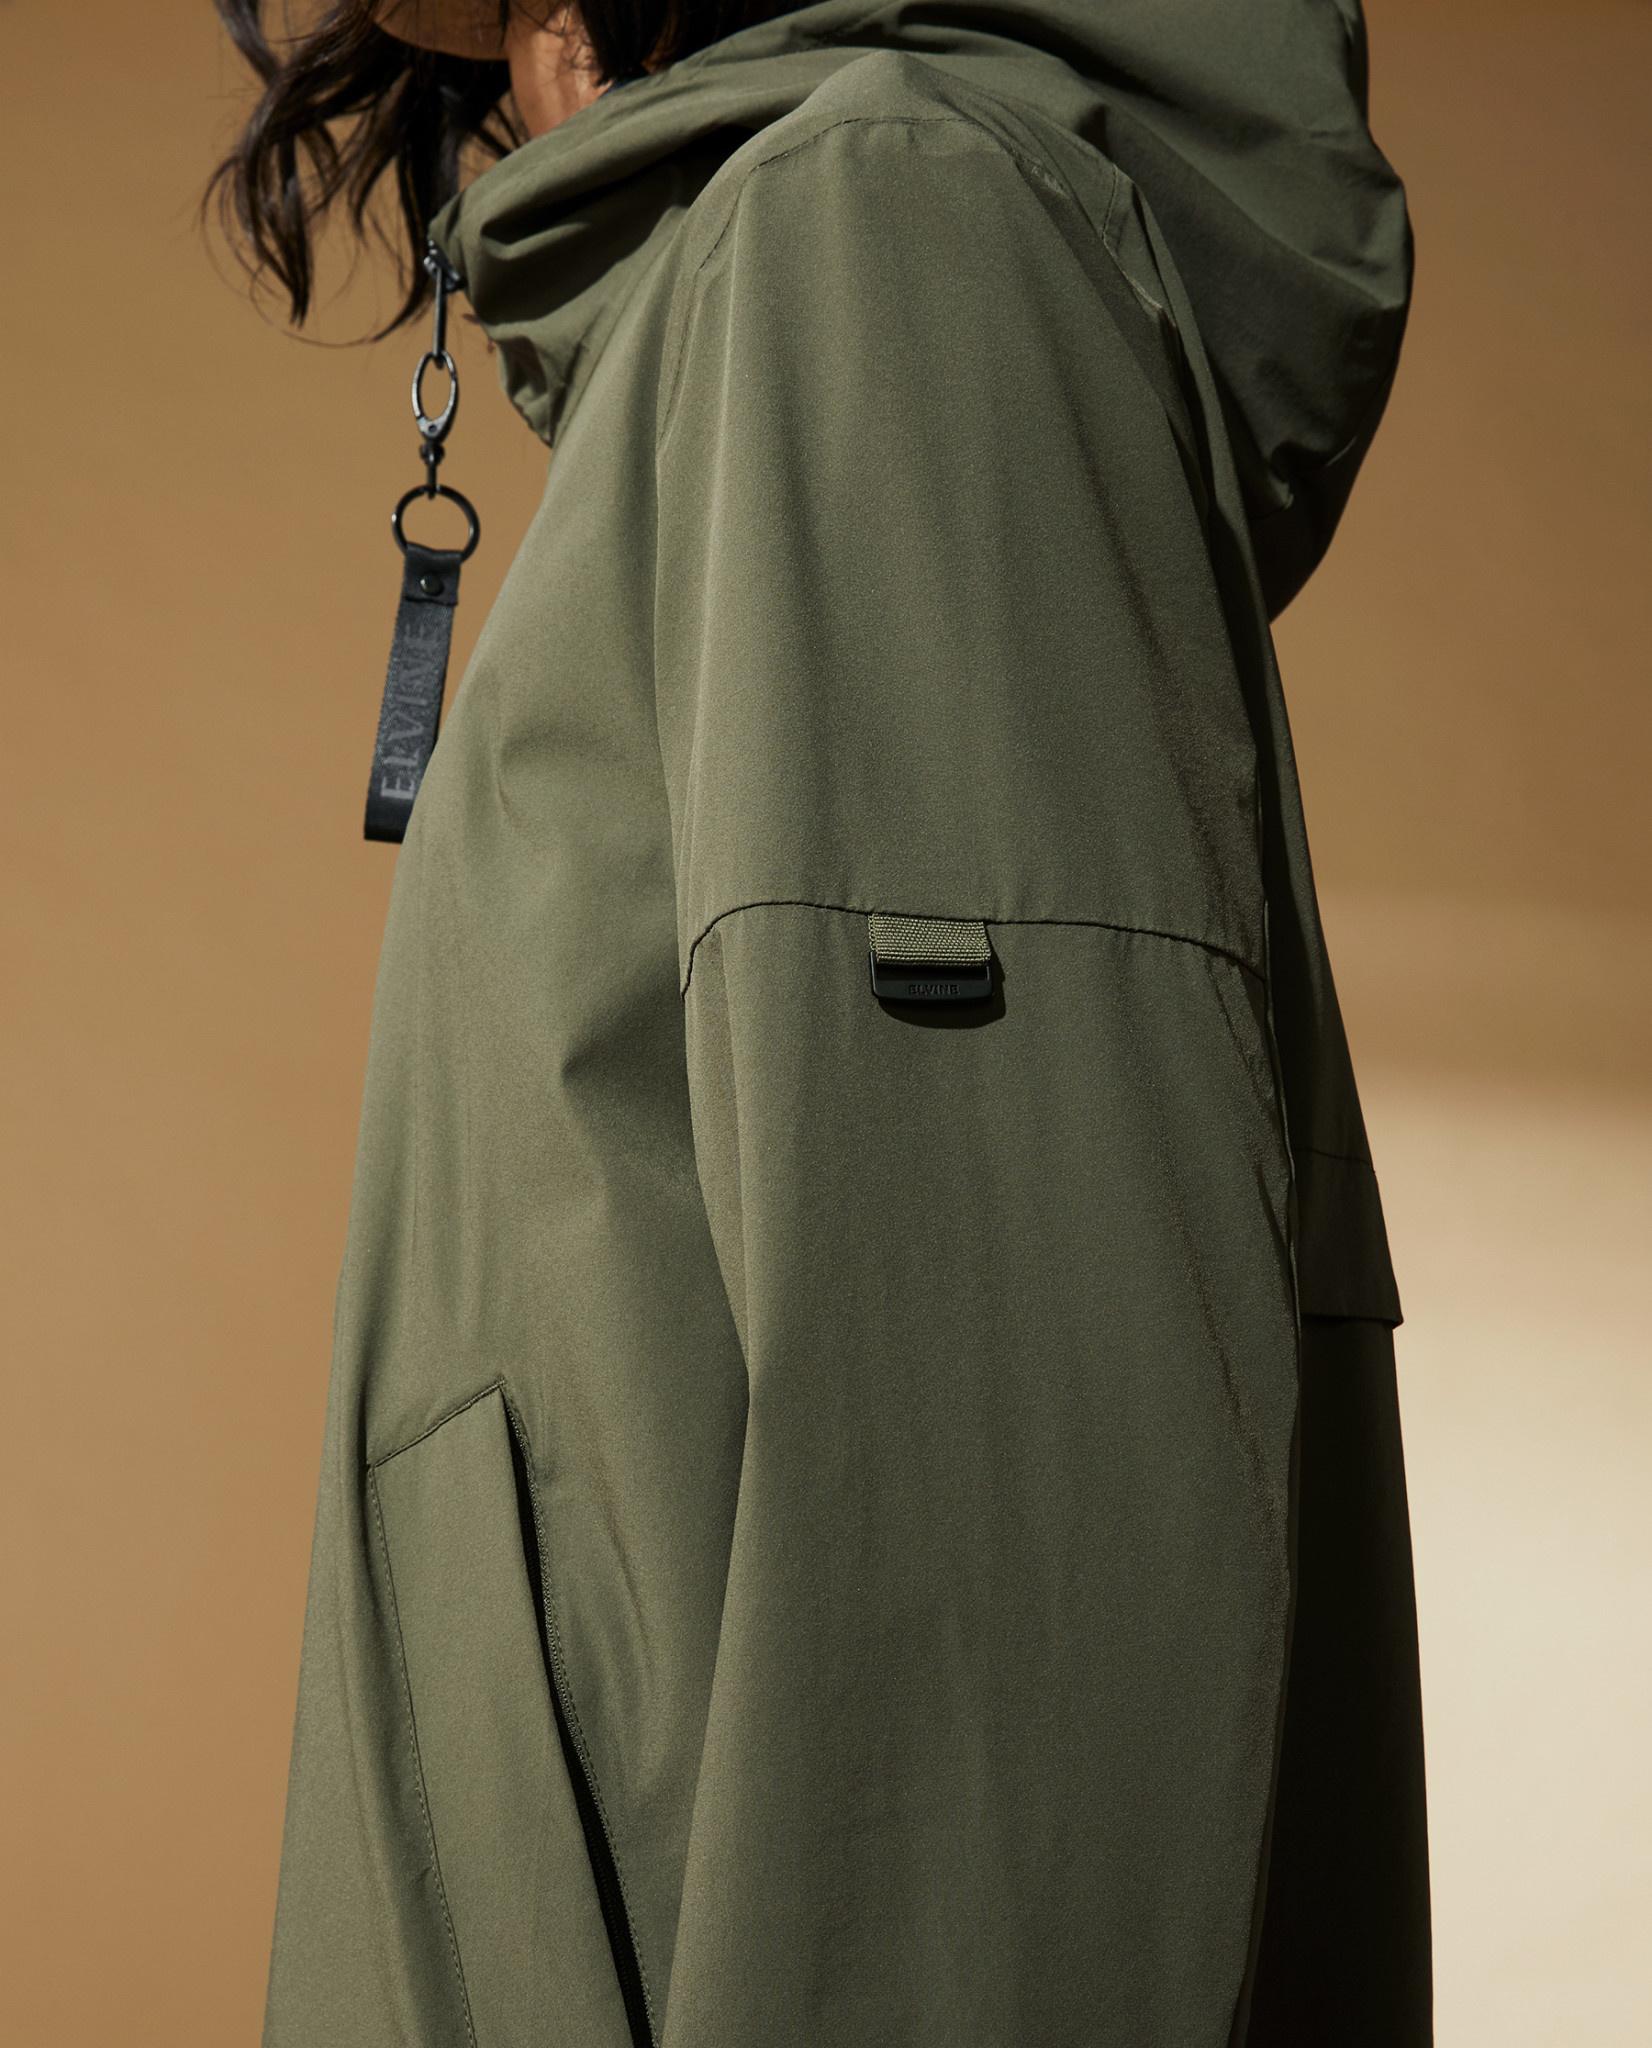 Elvine Elvine Magmar Jacket Geranium Green